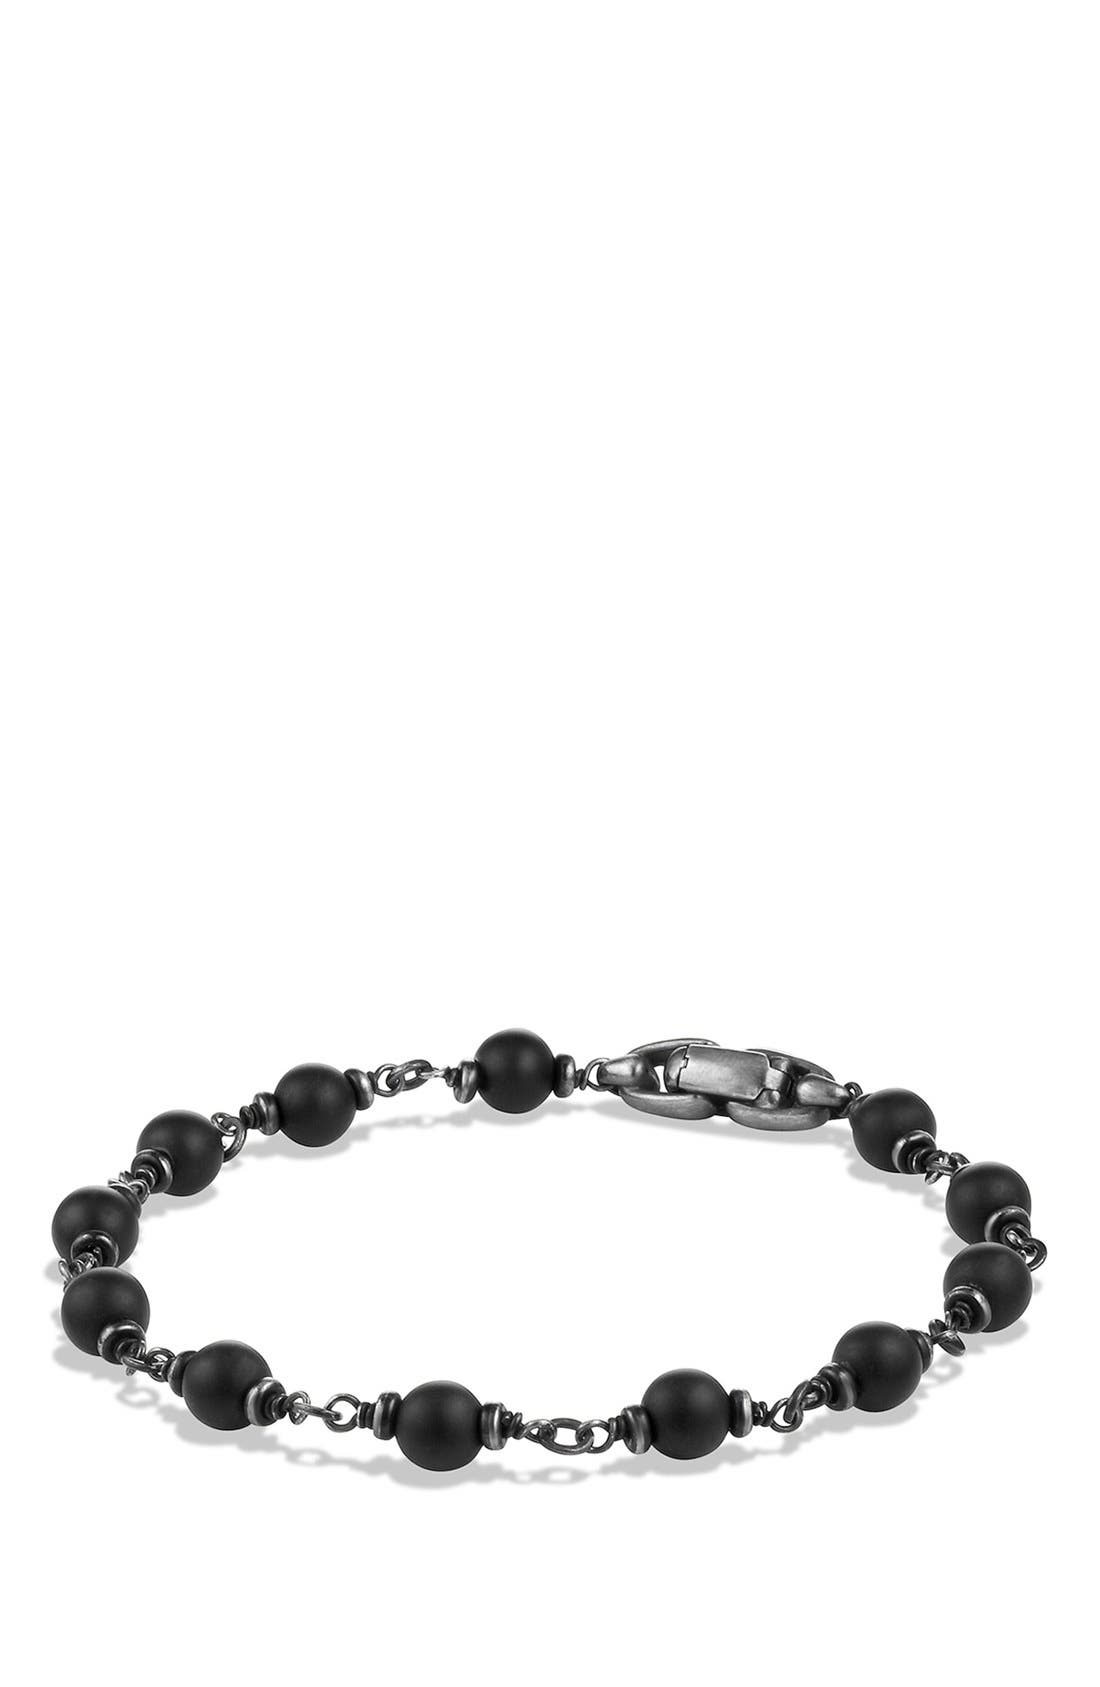 Main Image - David Yurman 'Spiritual Beads' Rosary Bead Bracelet